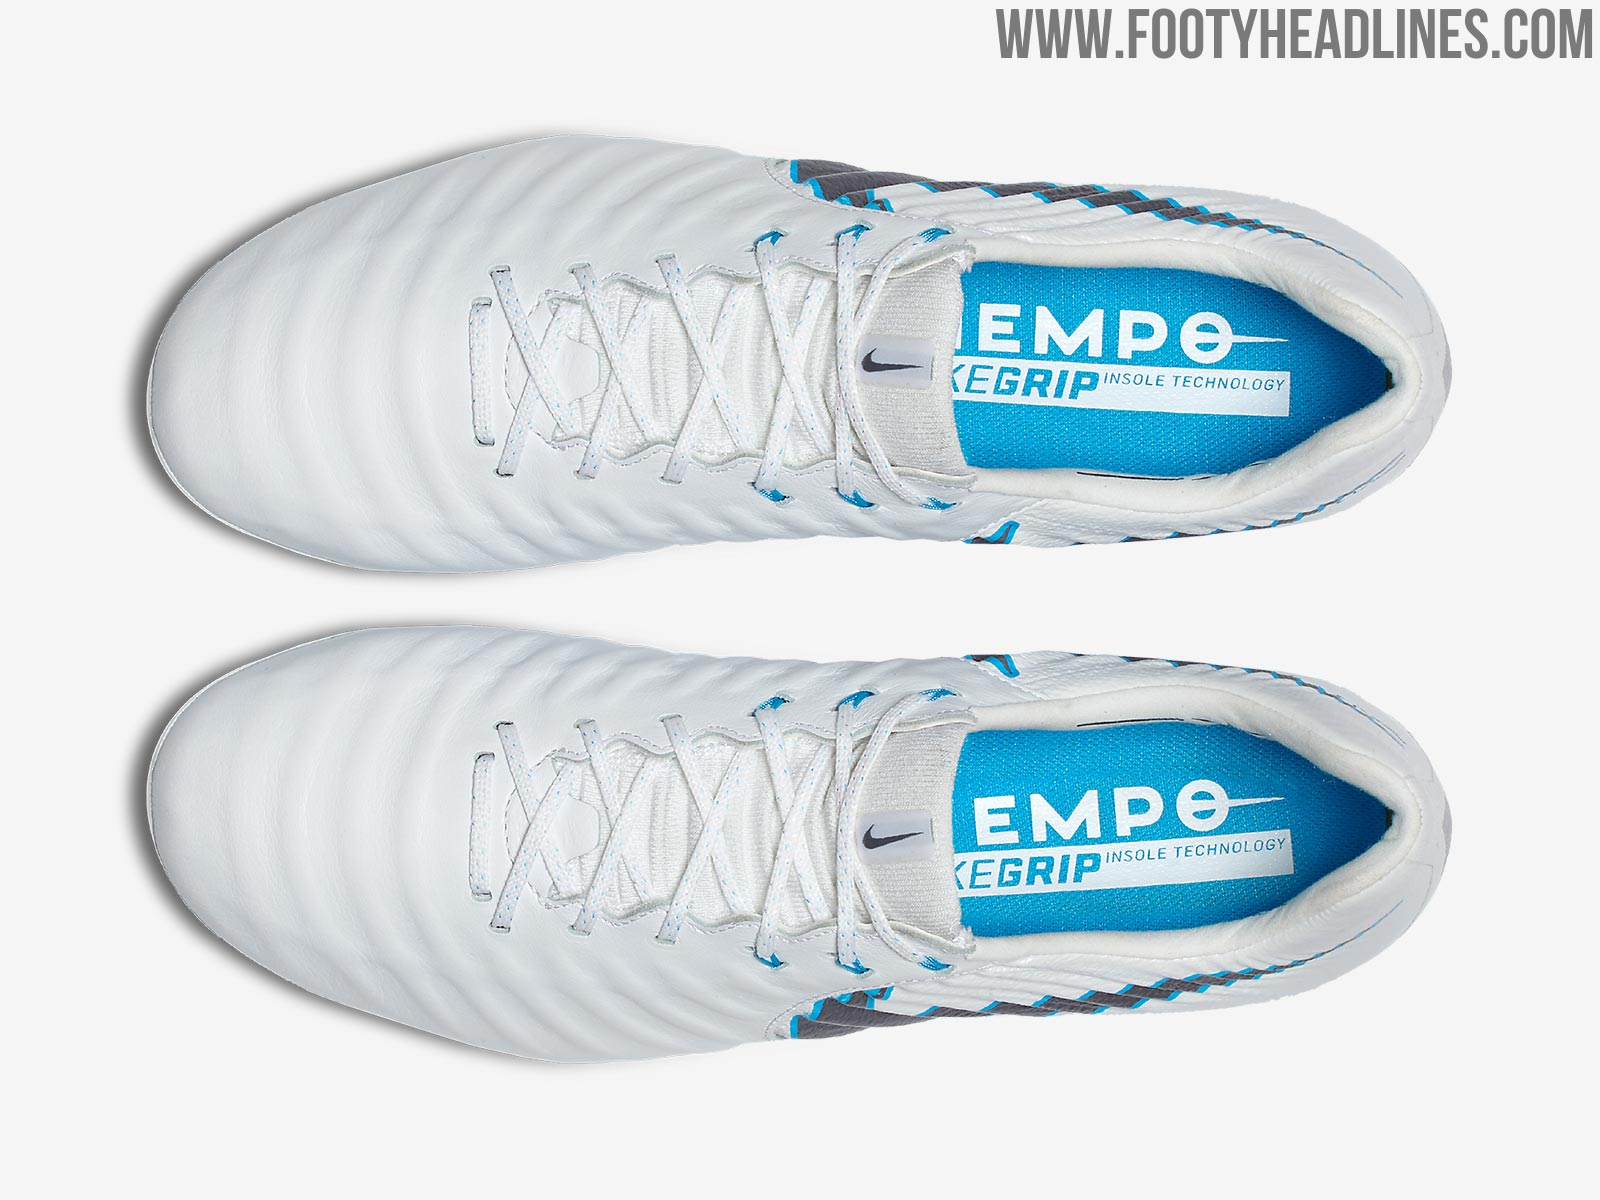 online retailer e34e4 b4436 Nike Tiempo Legend 2018 World Cup Boot Revealed | Futbolgrid